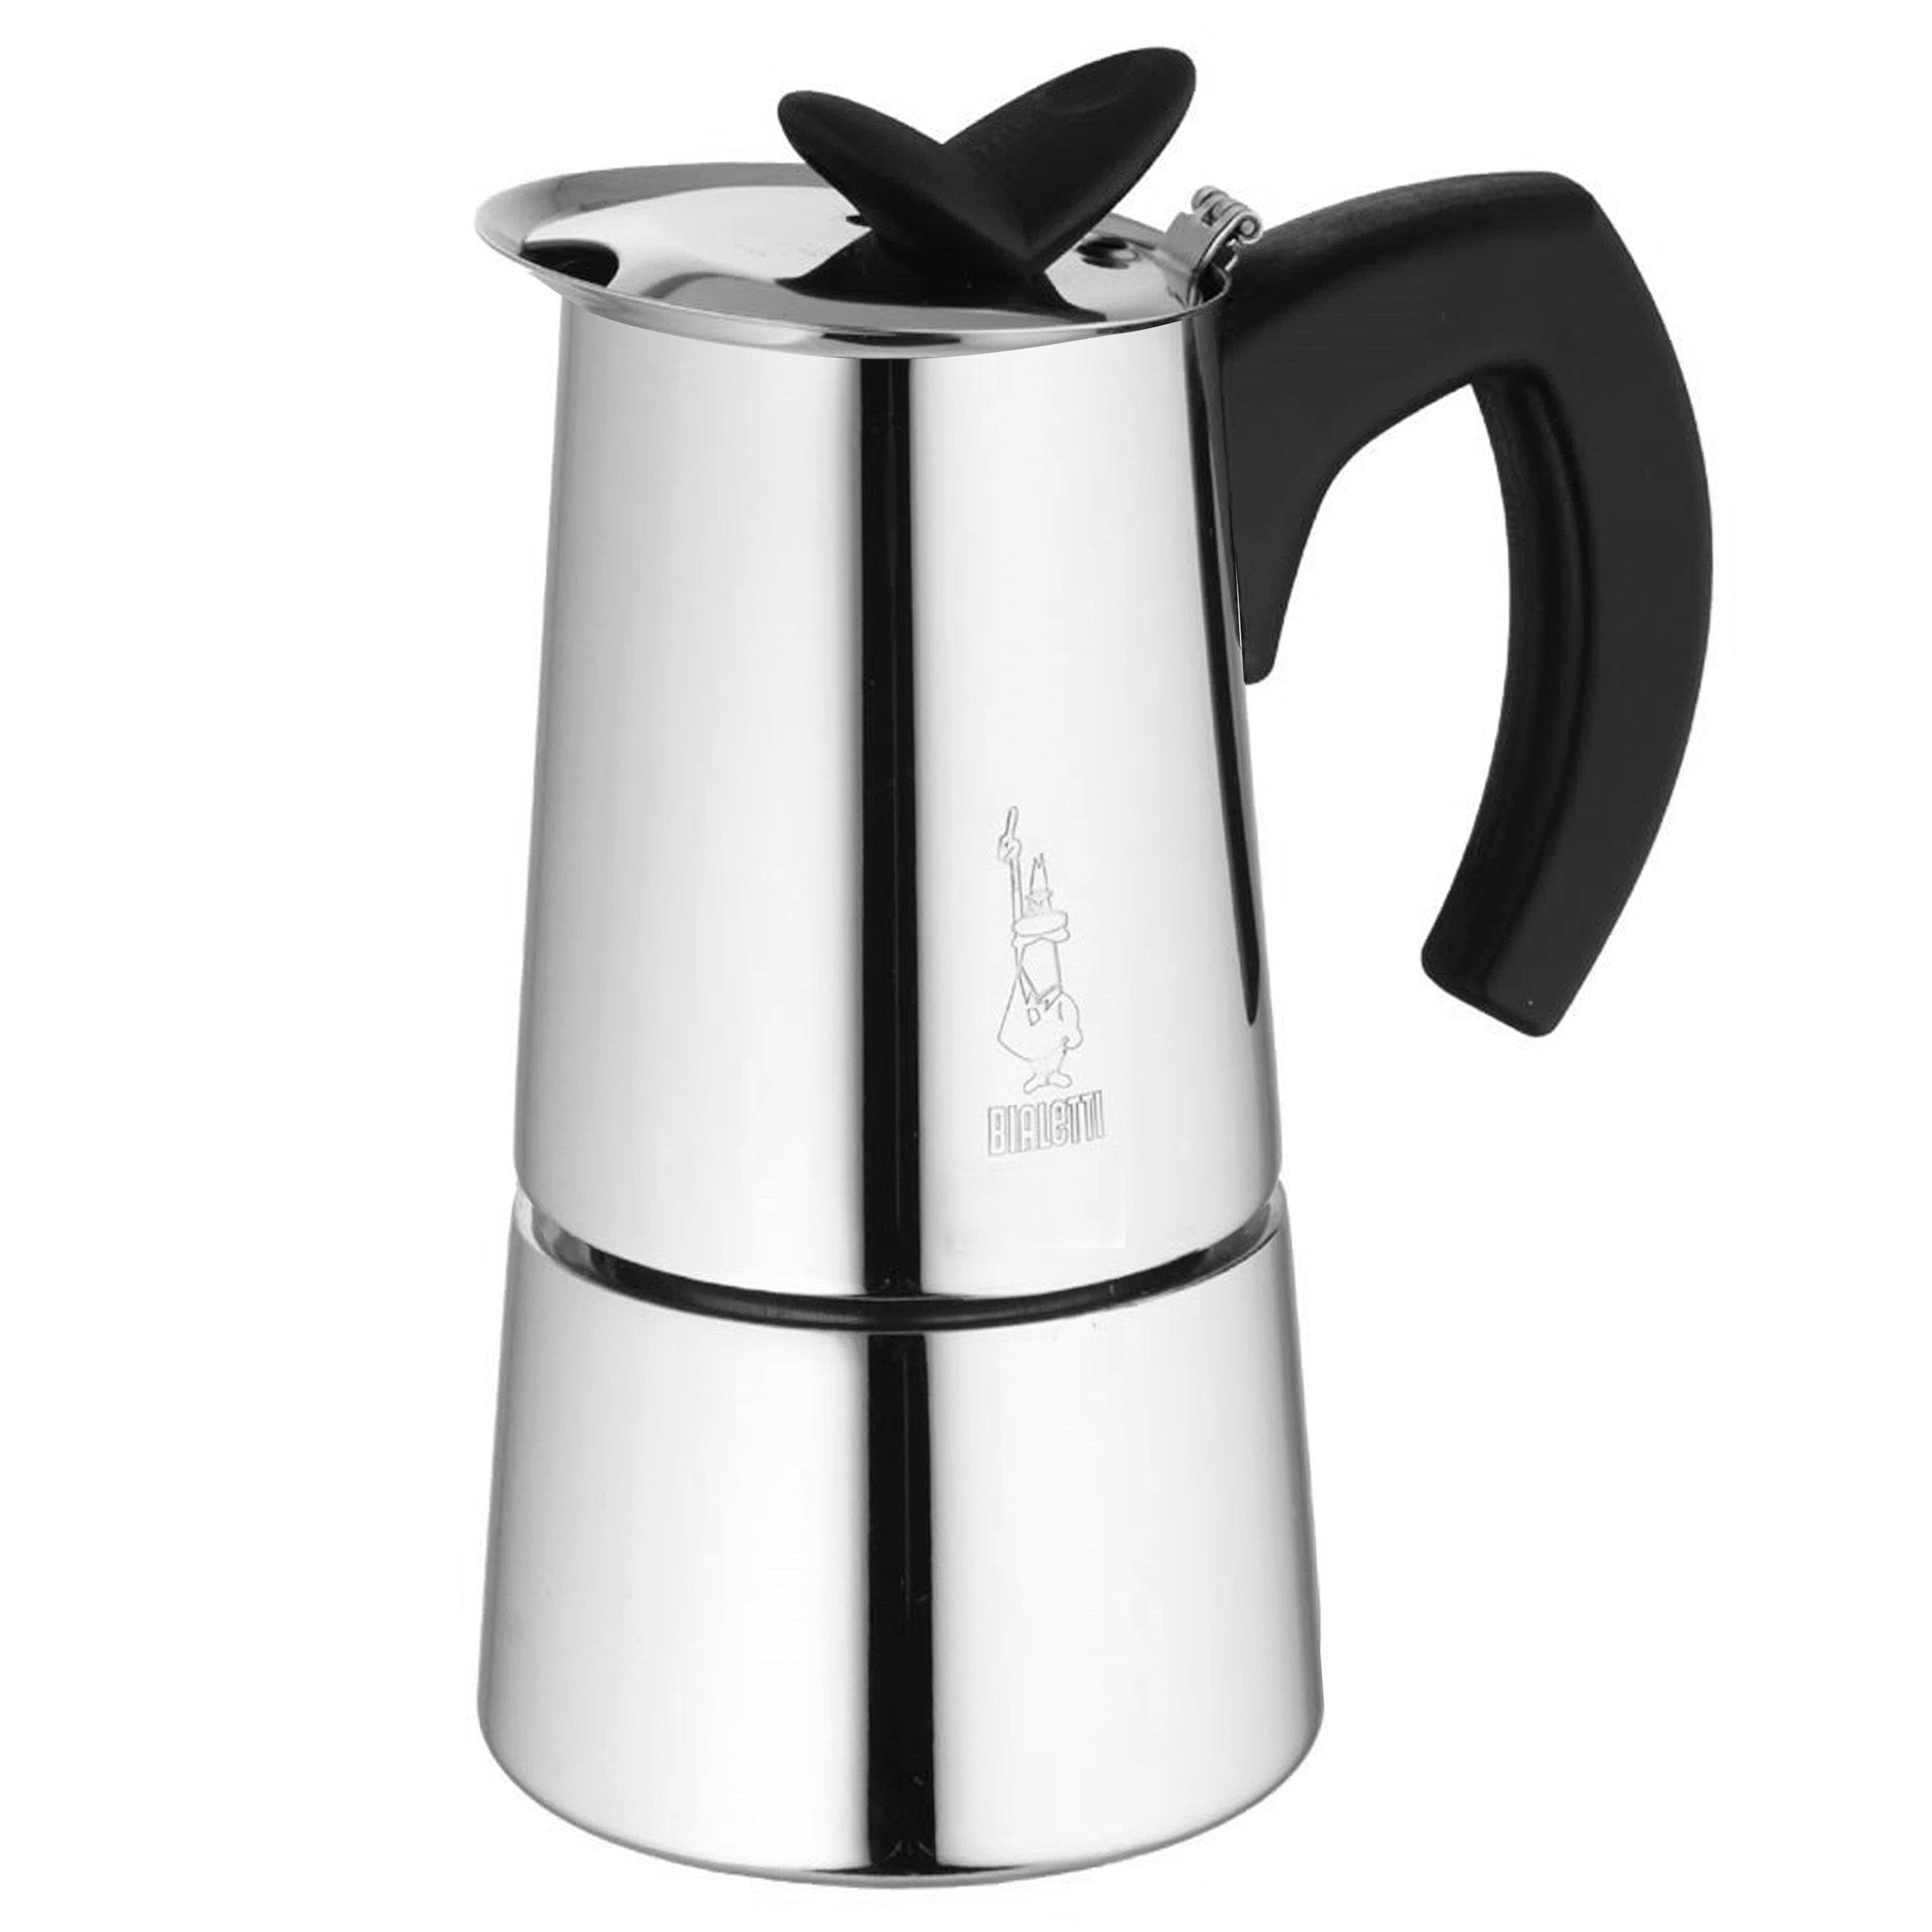 Bialetti - Musa Espresso Maker 10 Cup Peter s of Kensington